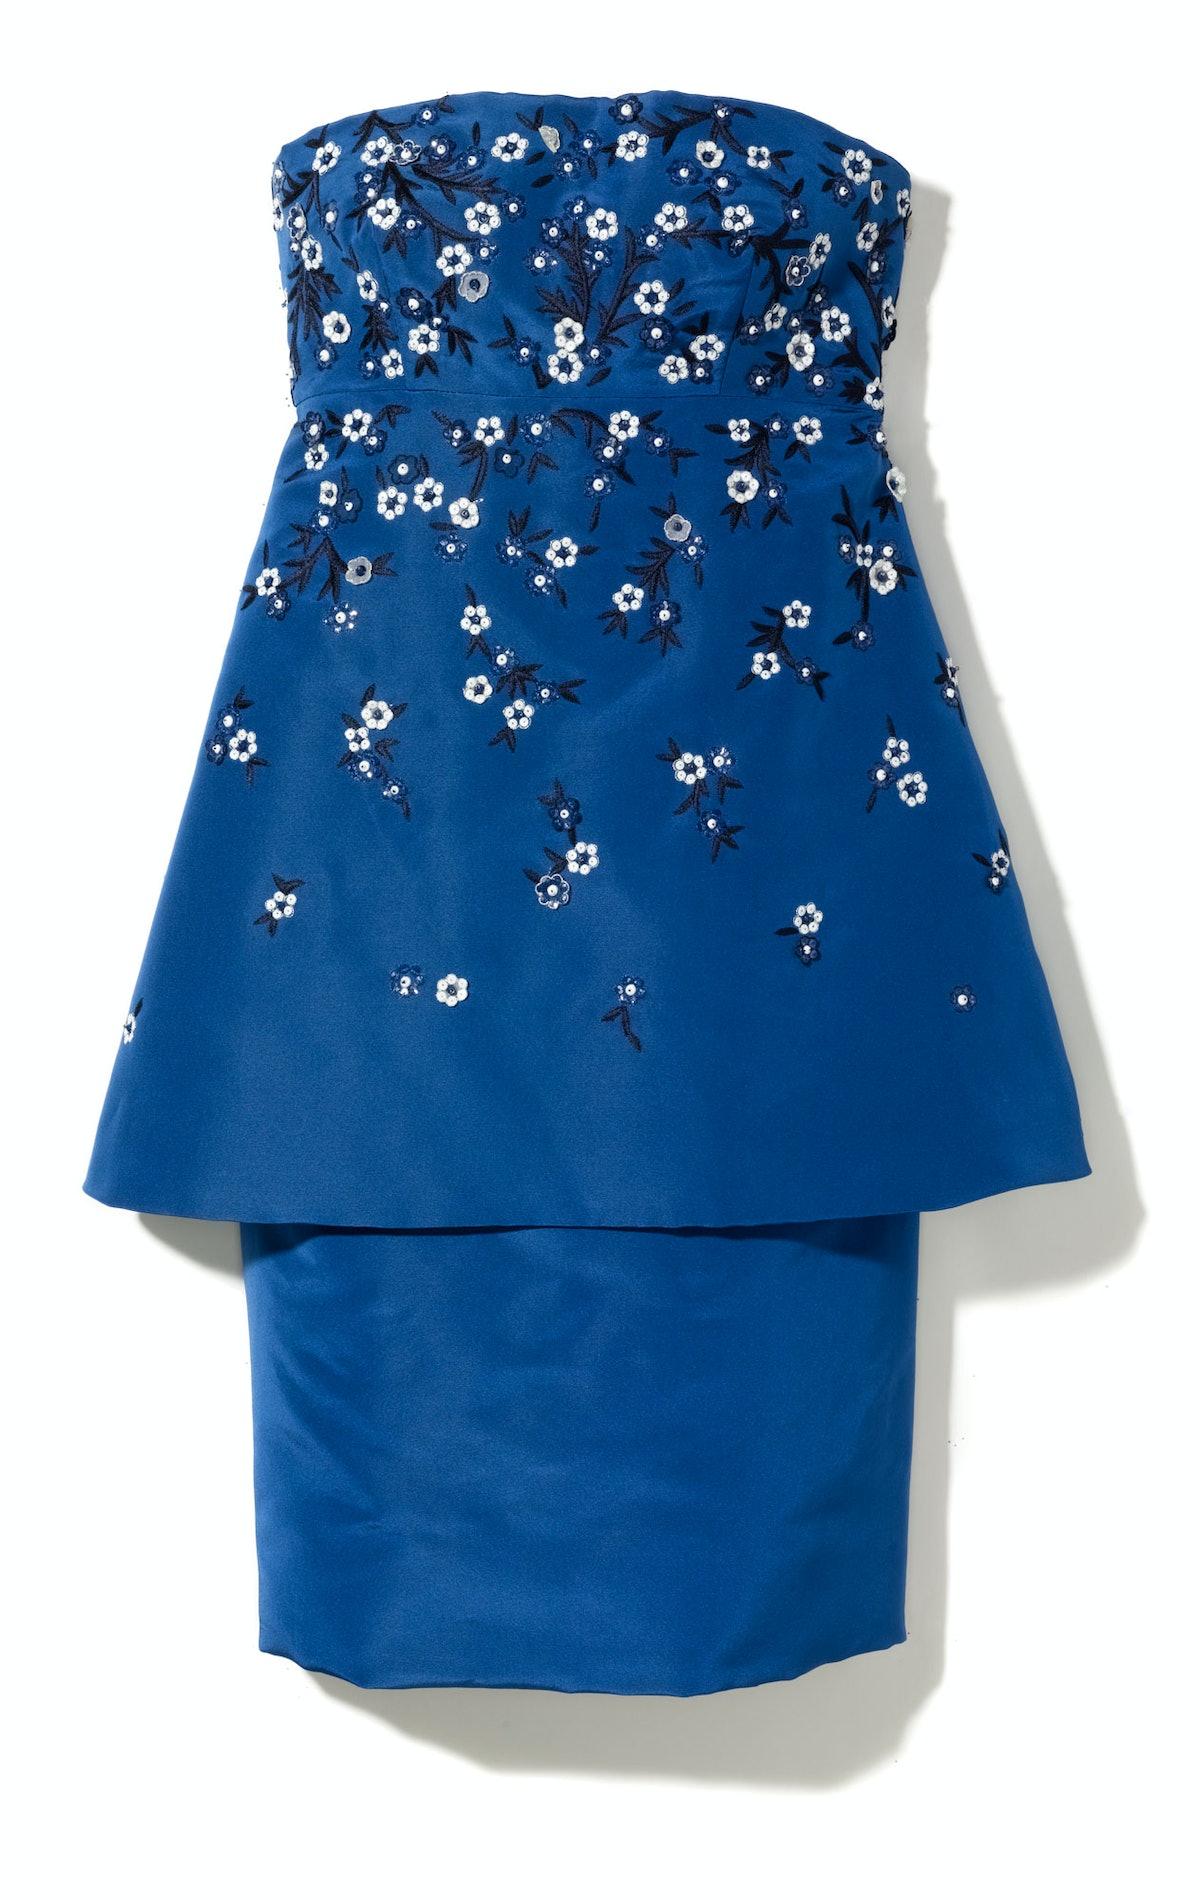 Oscar de la Renta top, $2,990, and skirt, $890, Nordstrom.